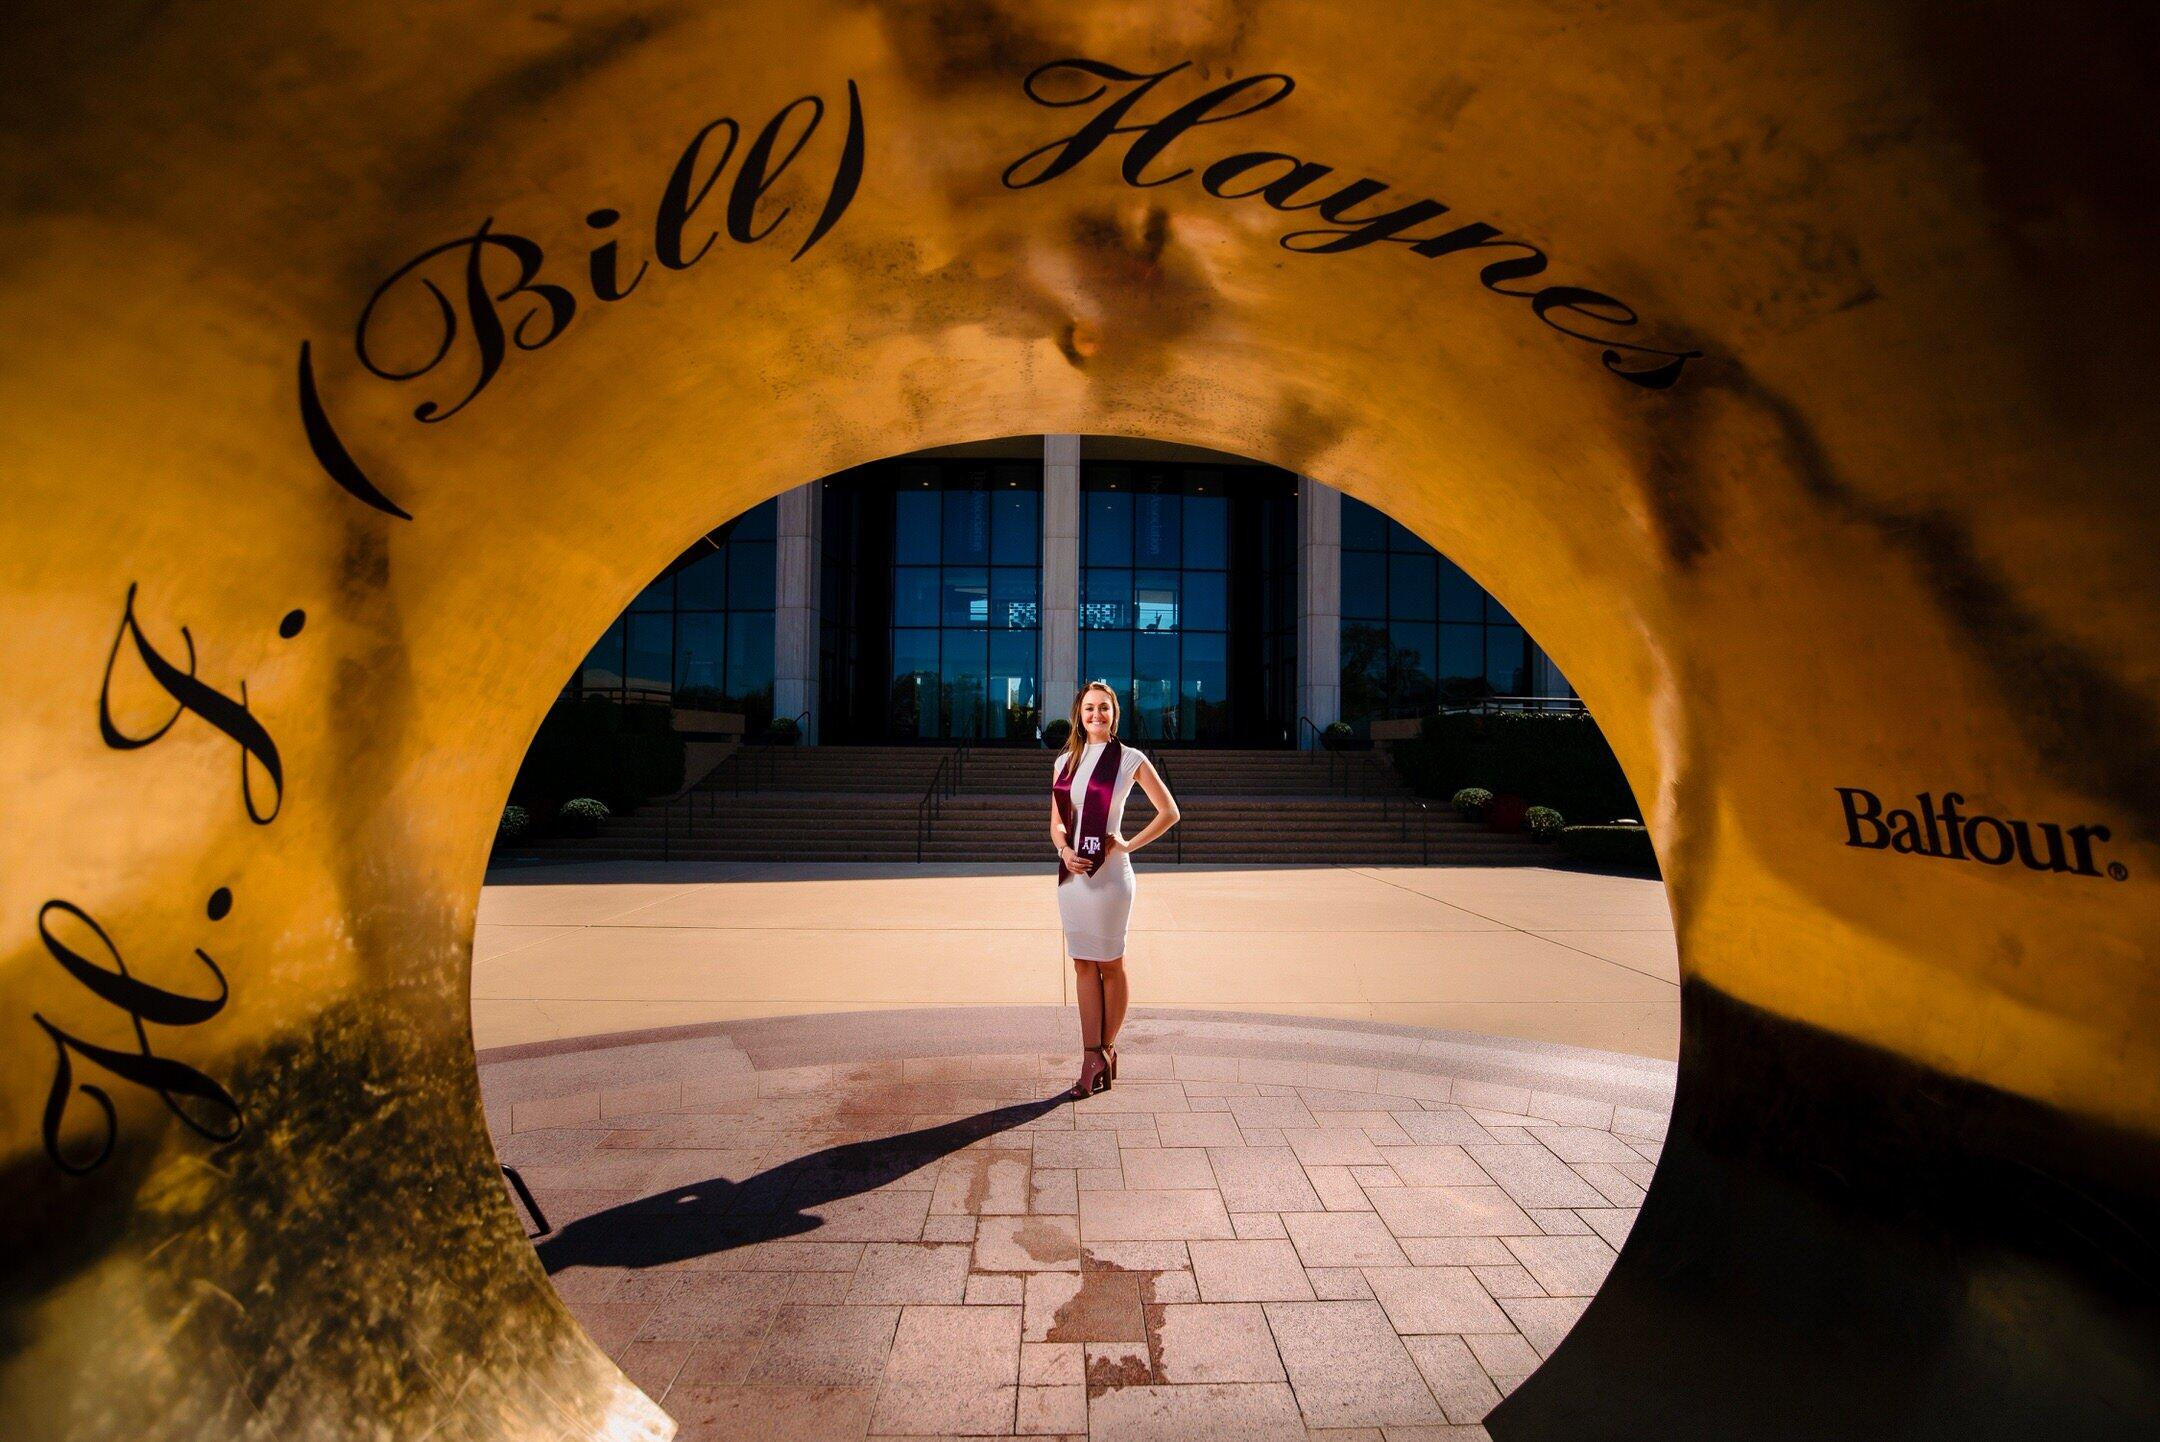 Leon-Contreras-Houston-Texas-Aggie-Wedding-Graduation-Engagement-Portrait-Photographer-4809.jpg